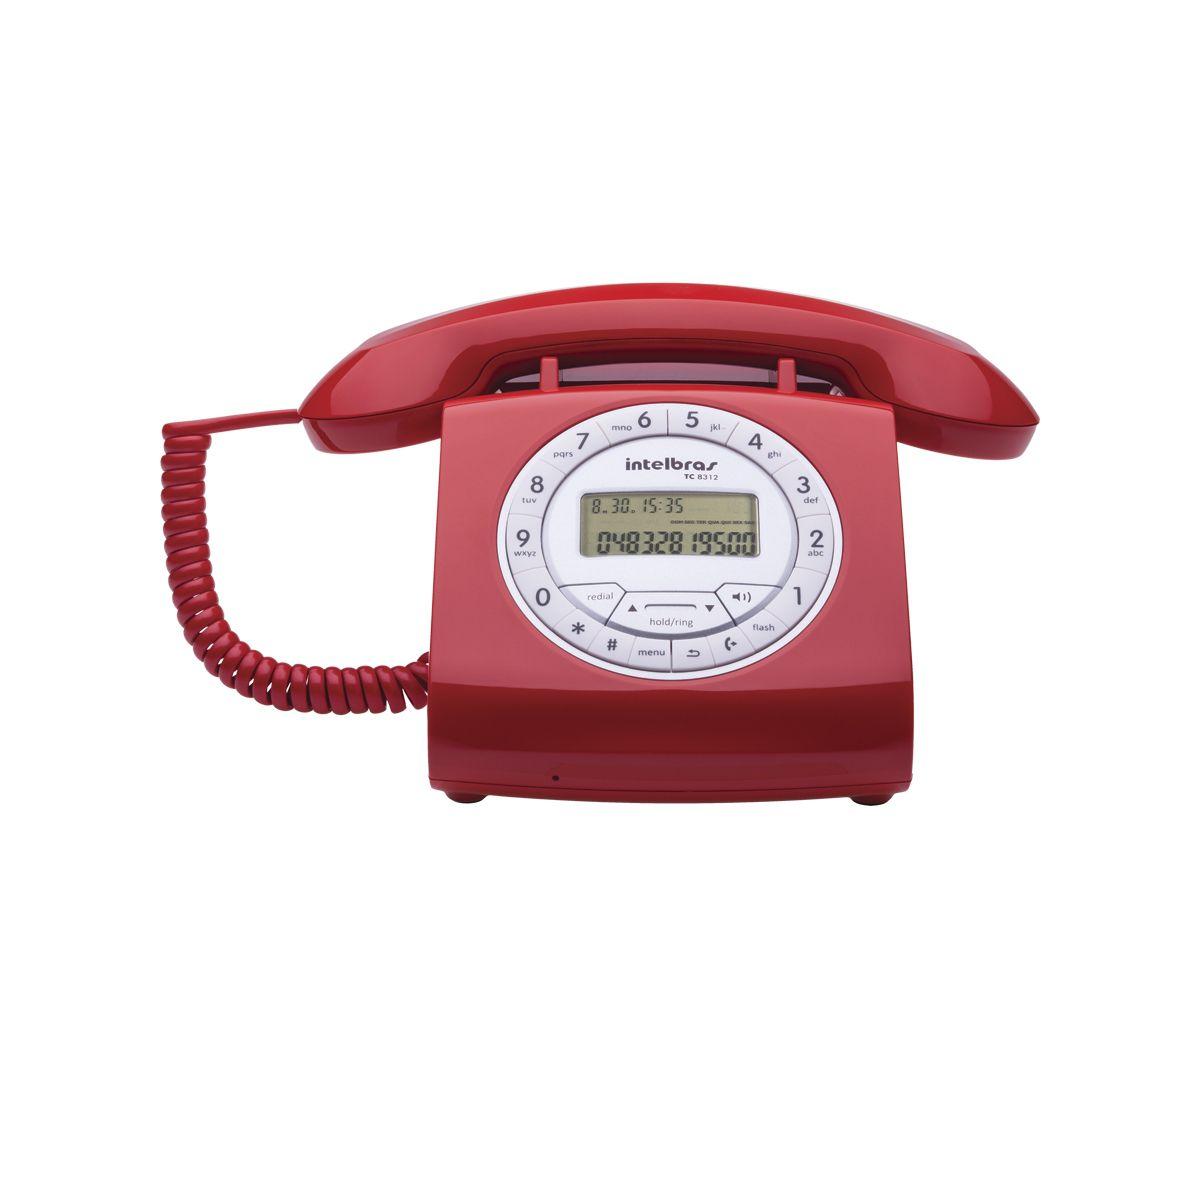 Telefone Tc-8312 Vermelho c/Identificador Intelbras